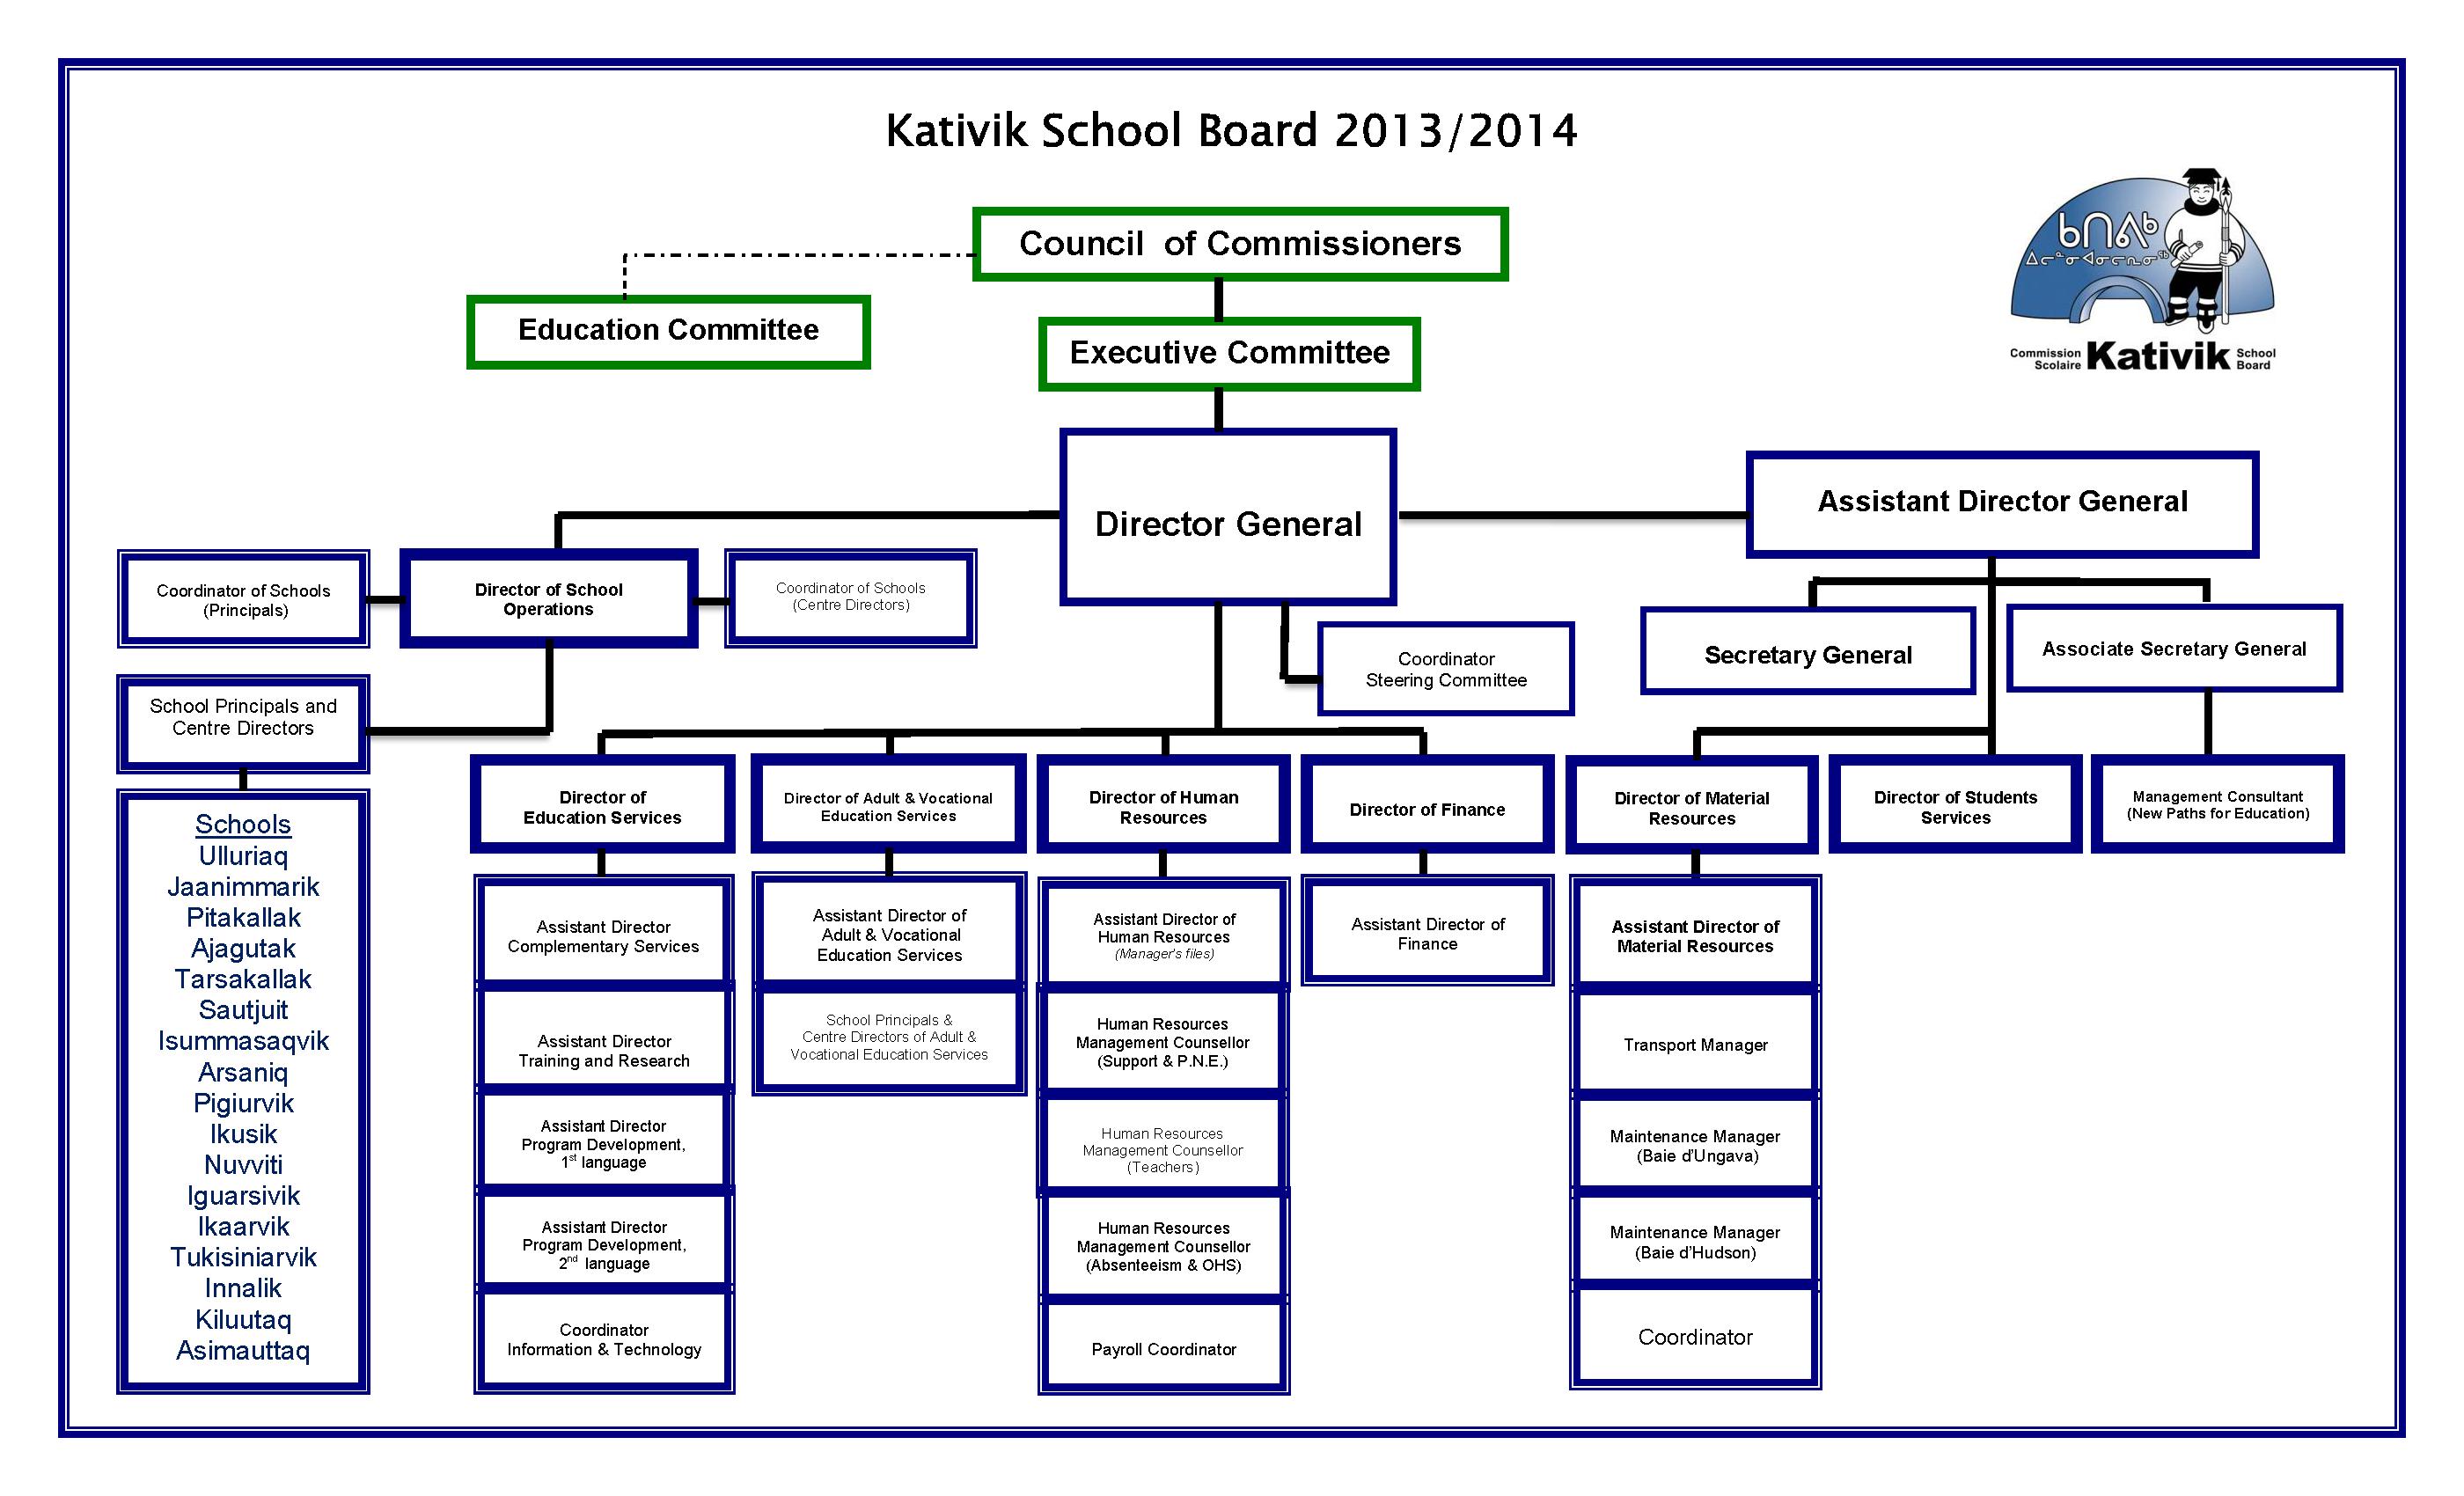 KSB organizational chart | ᑲᑎᕕᒃ ᐃᓕᓴᕐᓂᓕᕆᓂᖅ <br ...